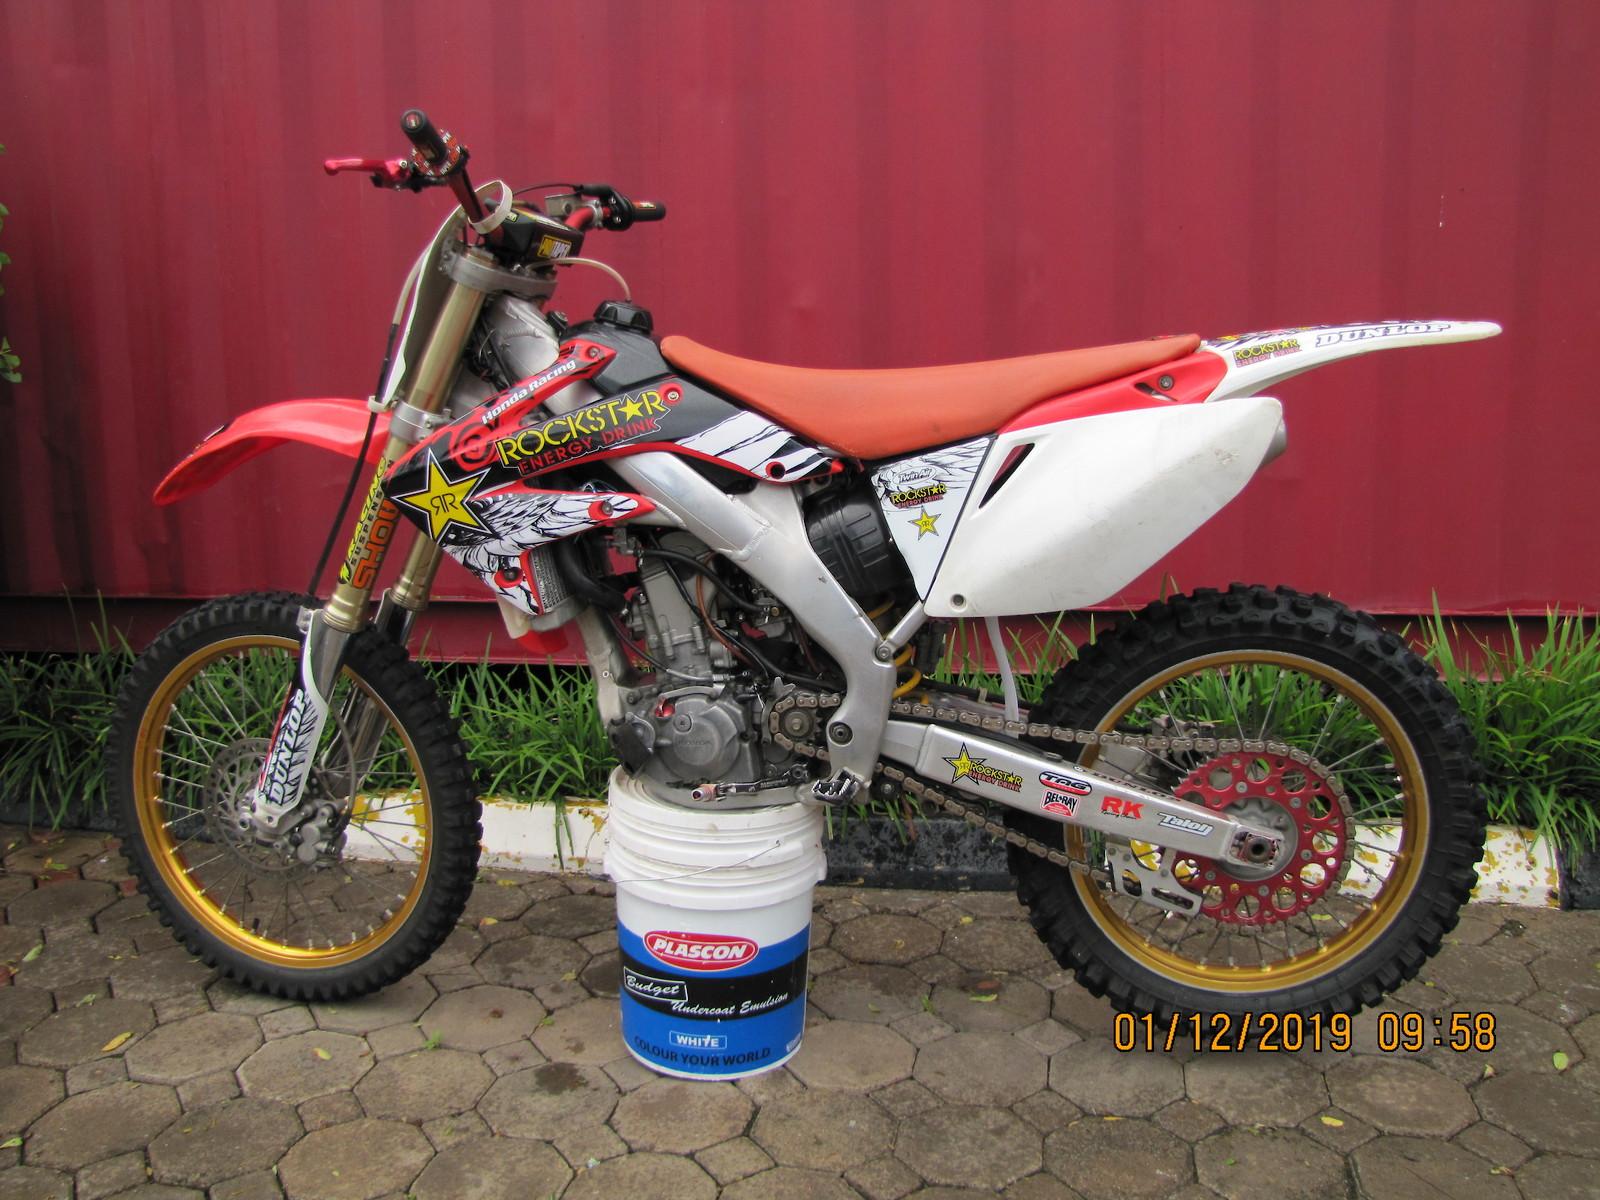 MY08 Honda crf250r